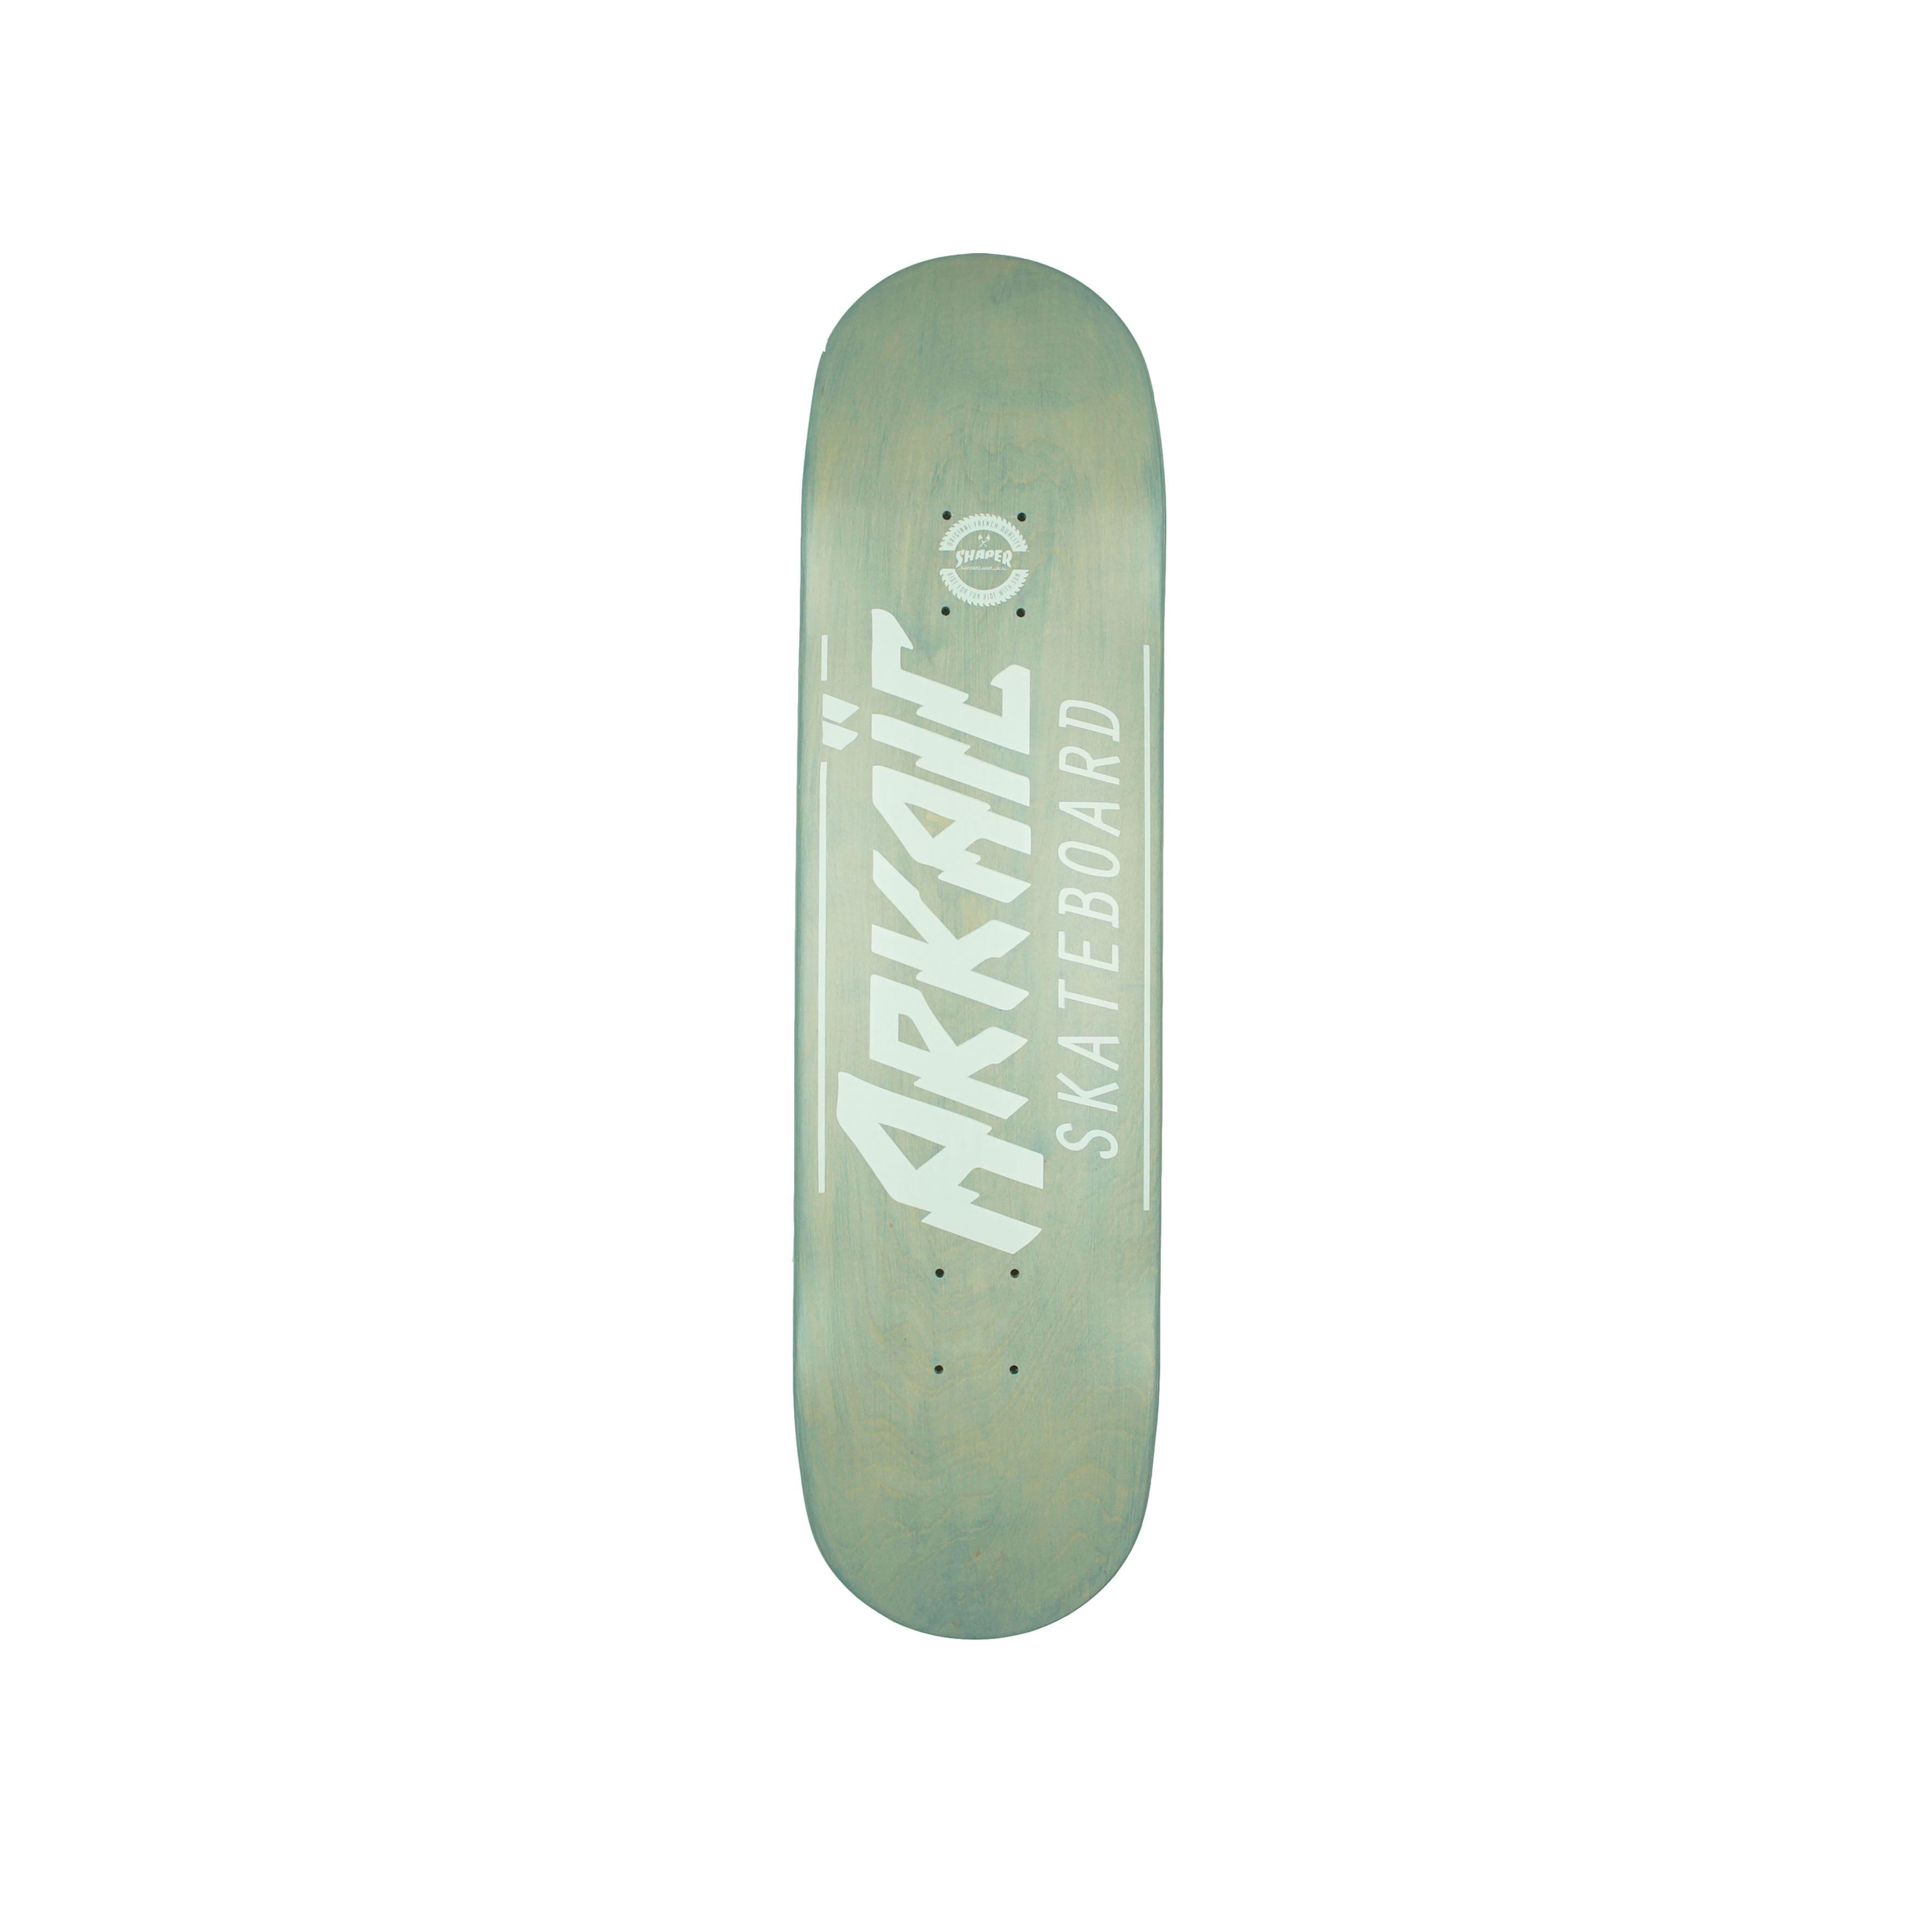 Skateboard made in France Arkaïc 2018